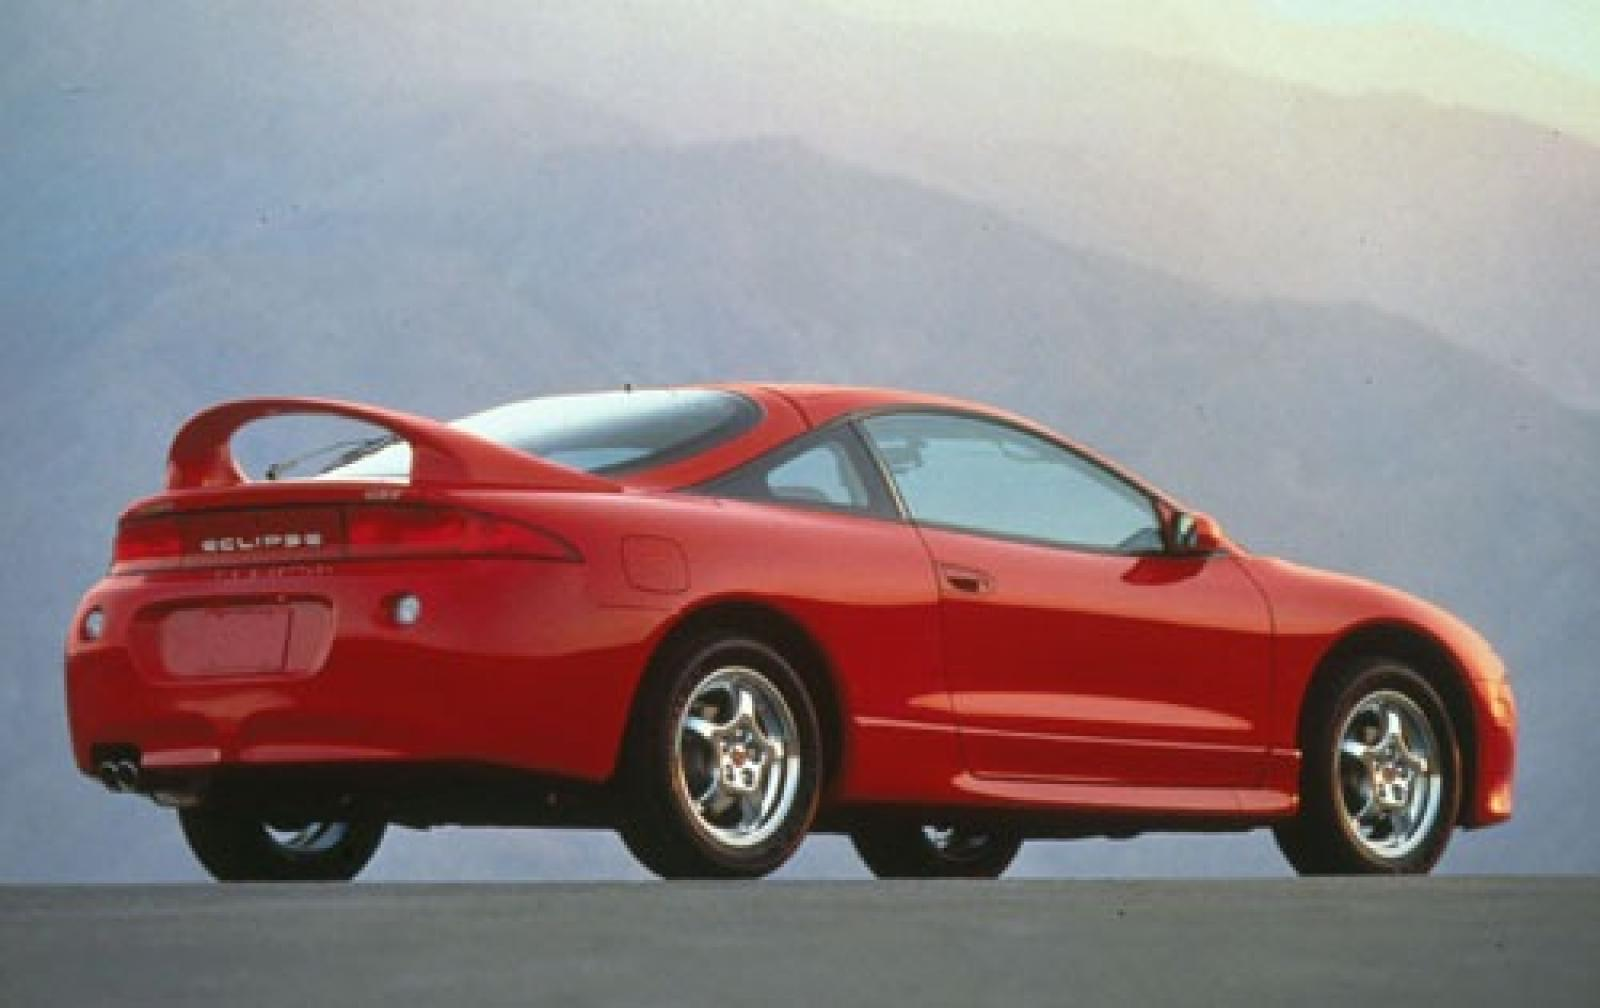 1998 Mitsubishi Eclipse Gs 1998 Mitsubishi Eclipse 2 Dr Gs Hatchback | Apps Directories